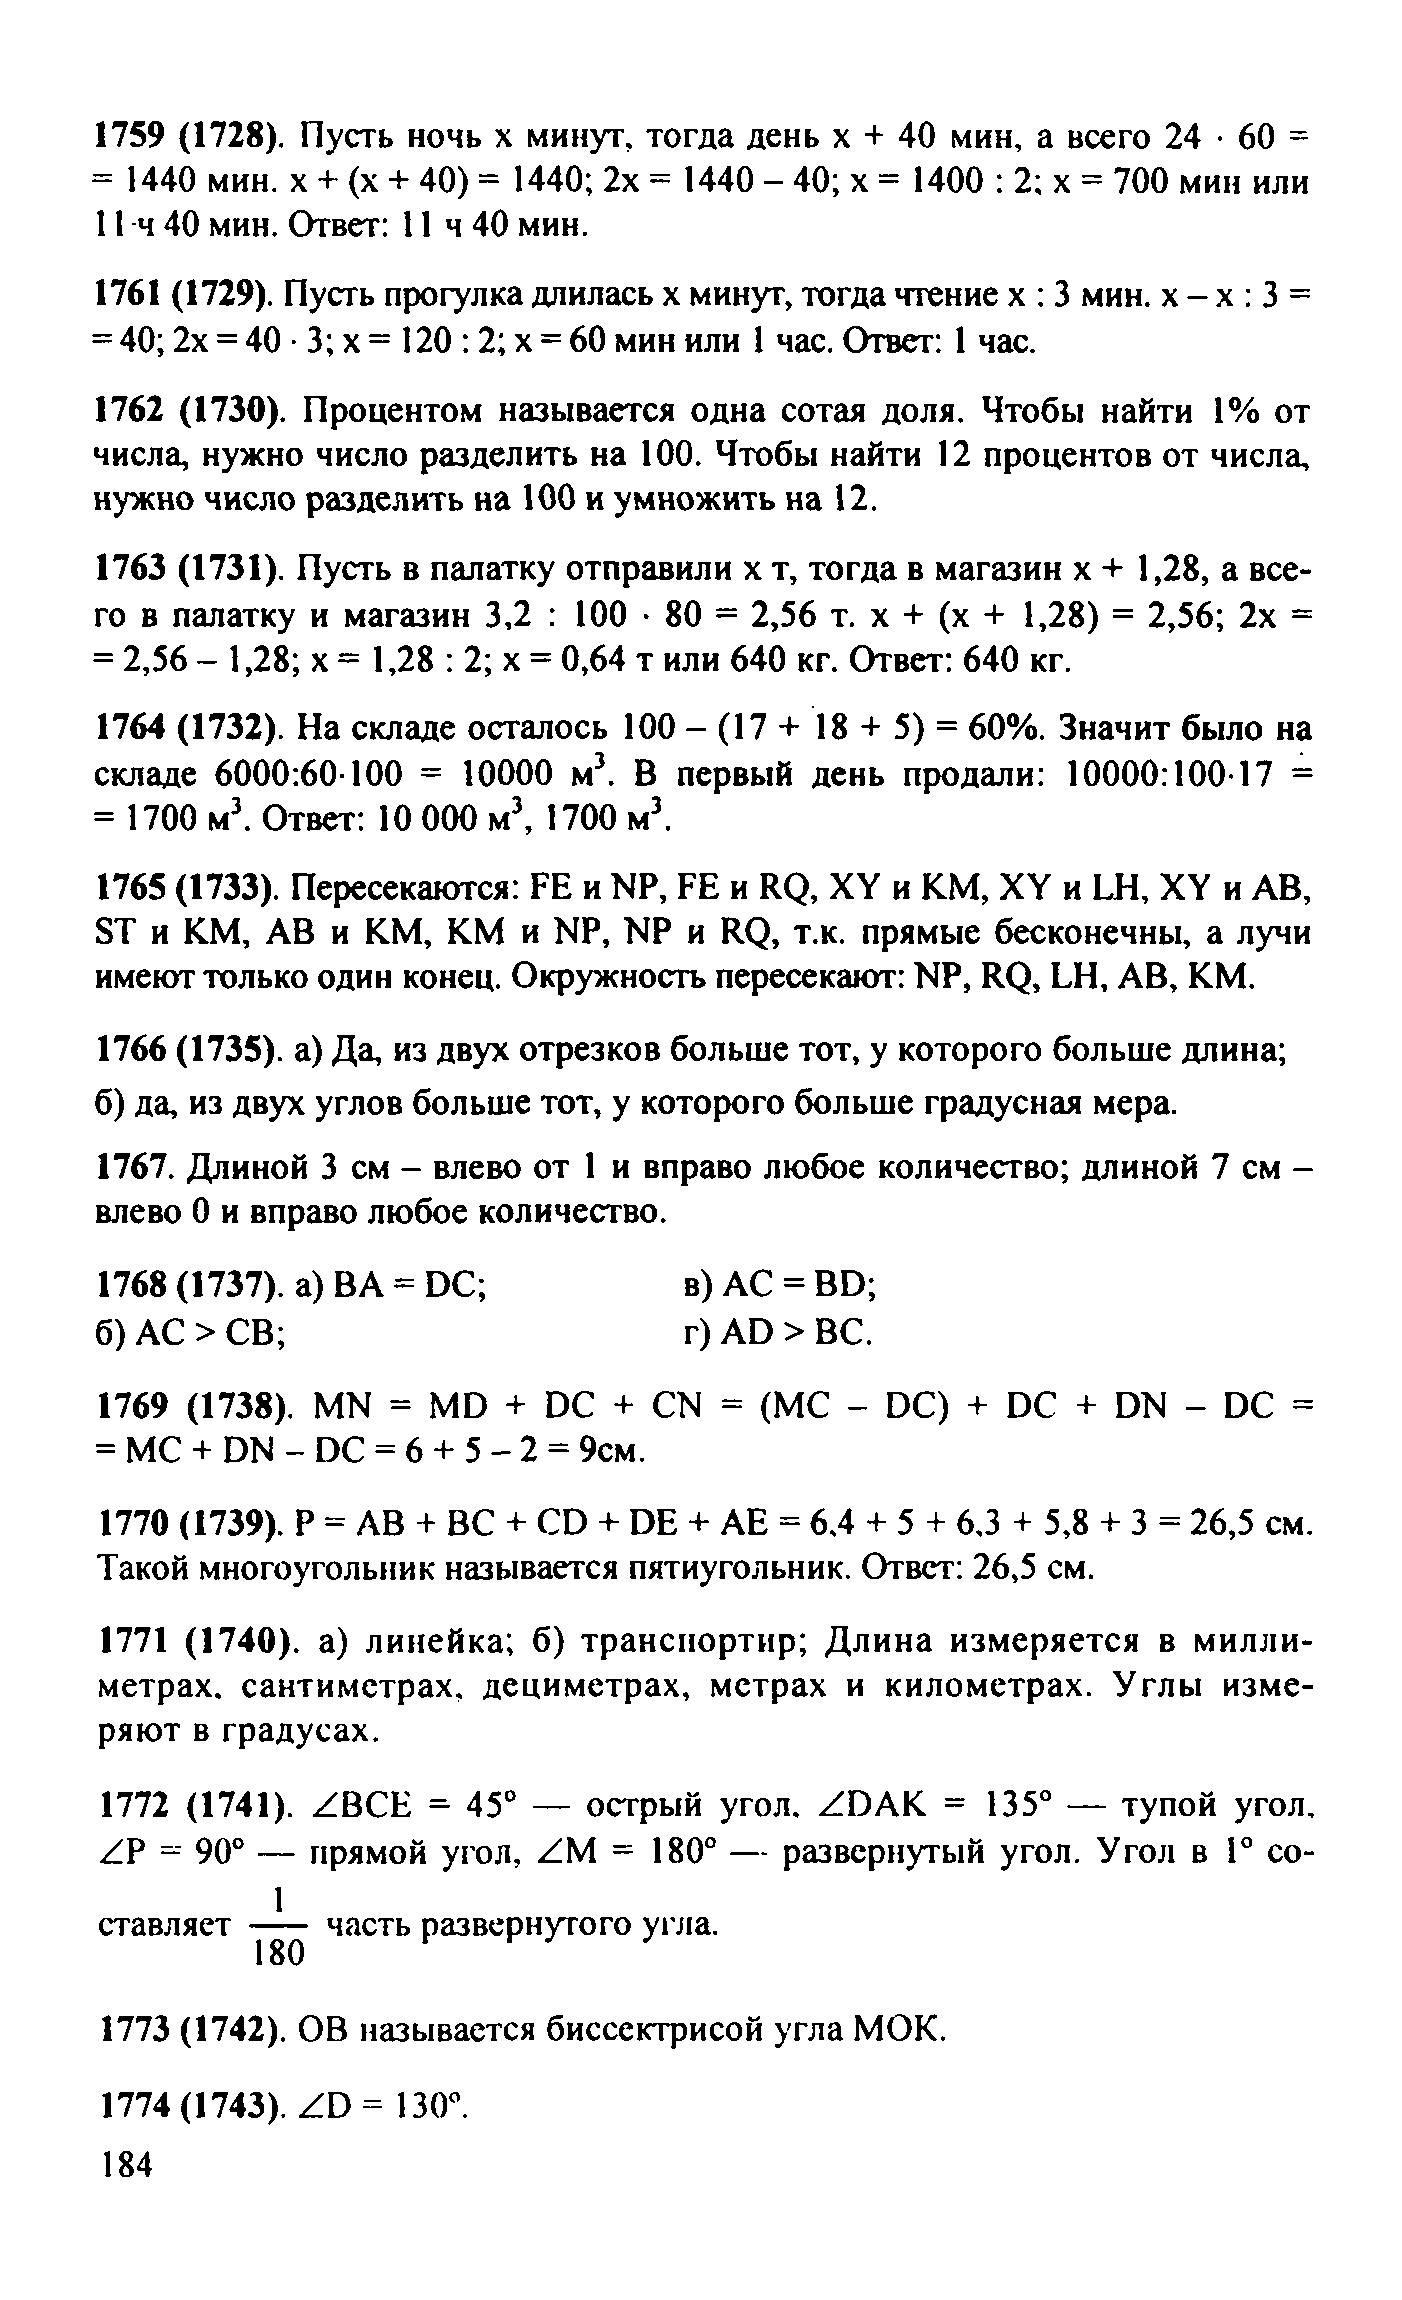 Решебник по математике 5 класс жохова